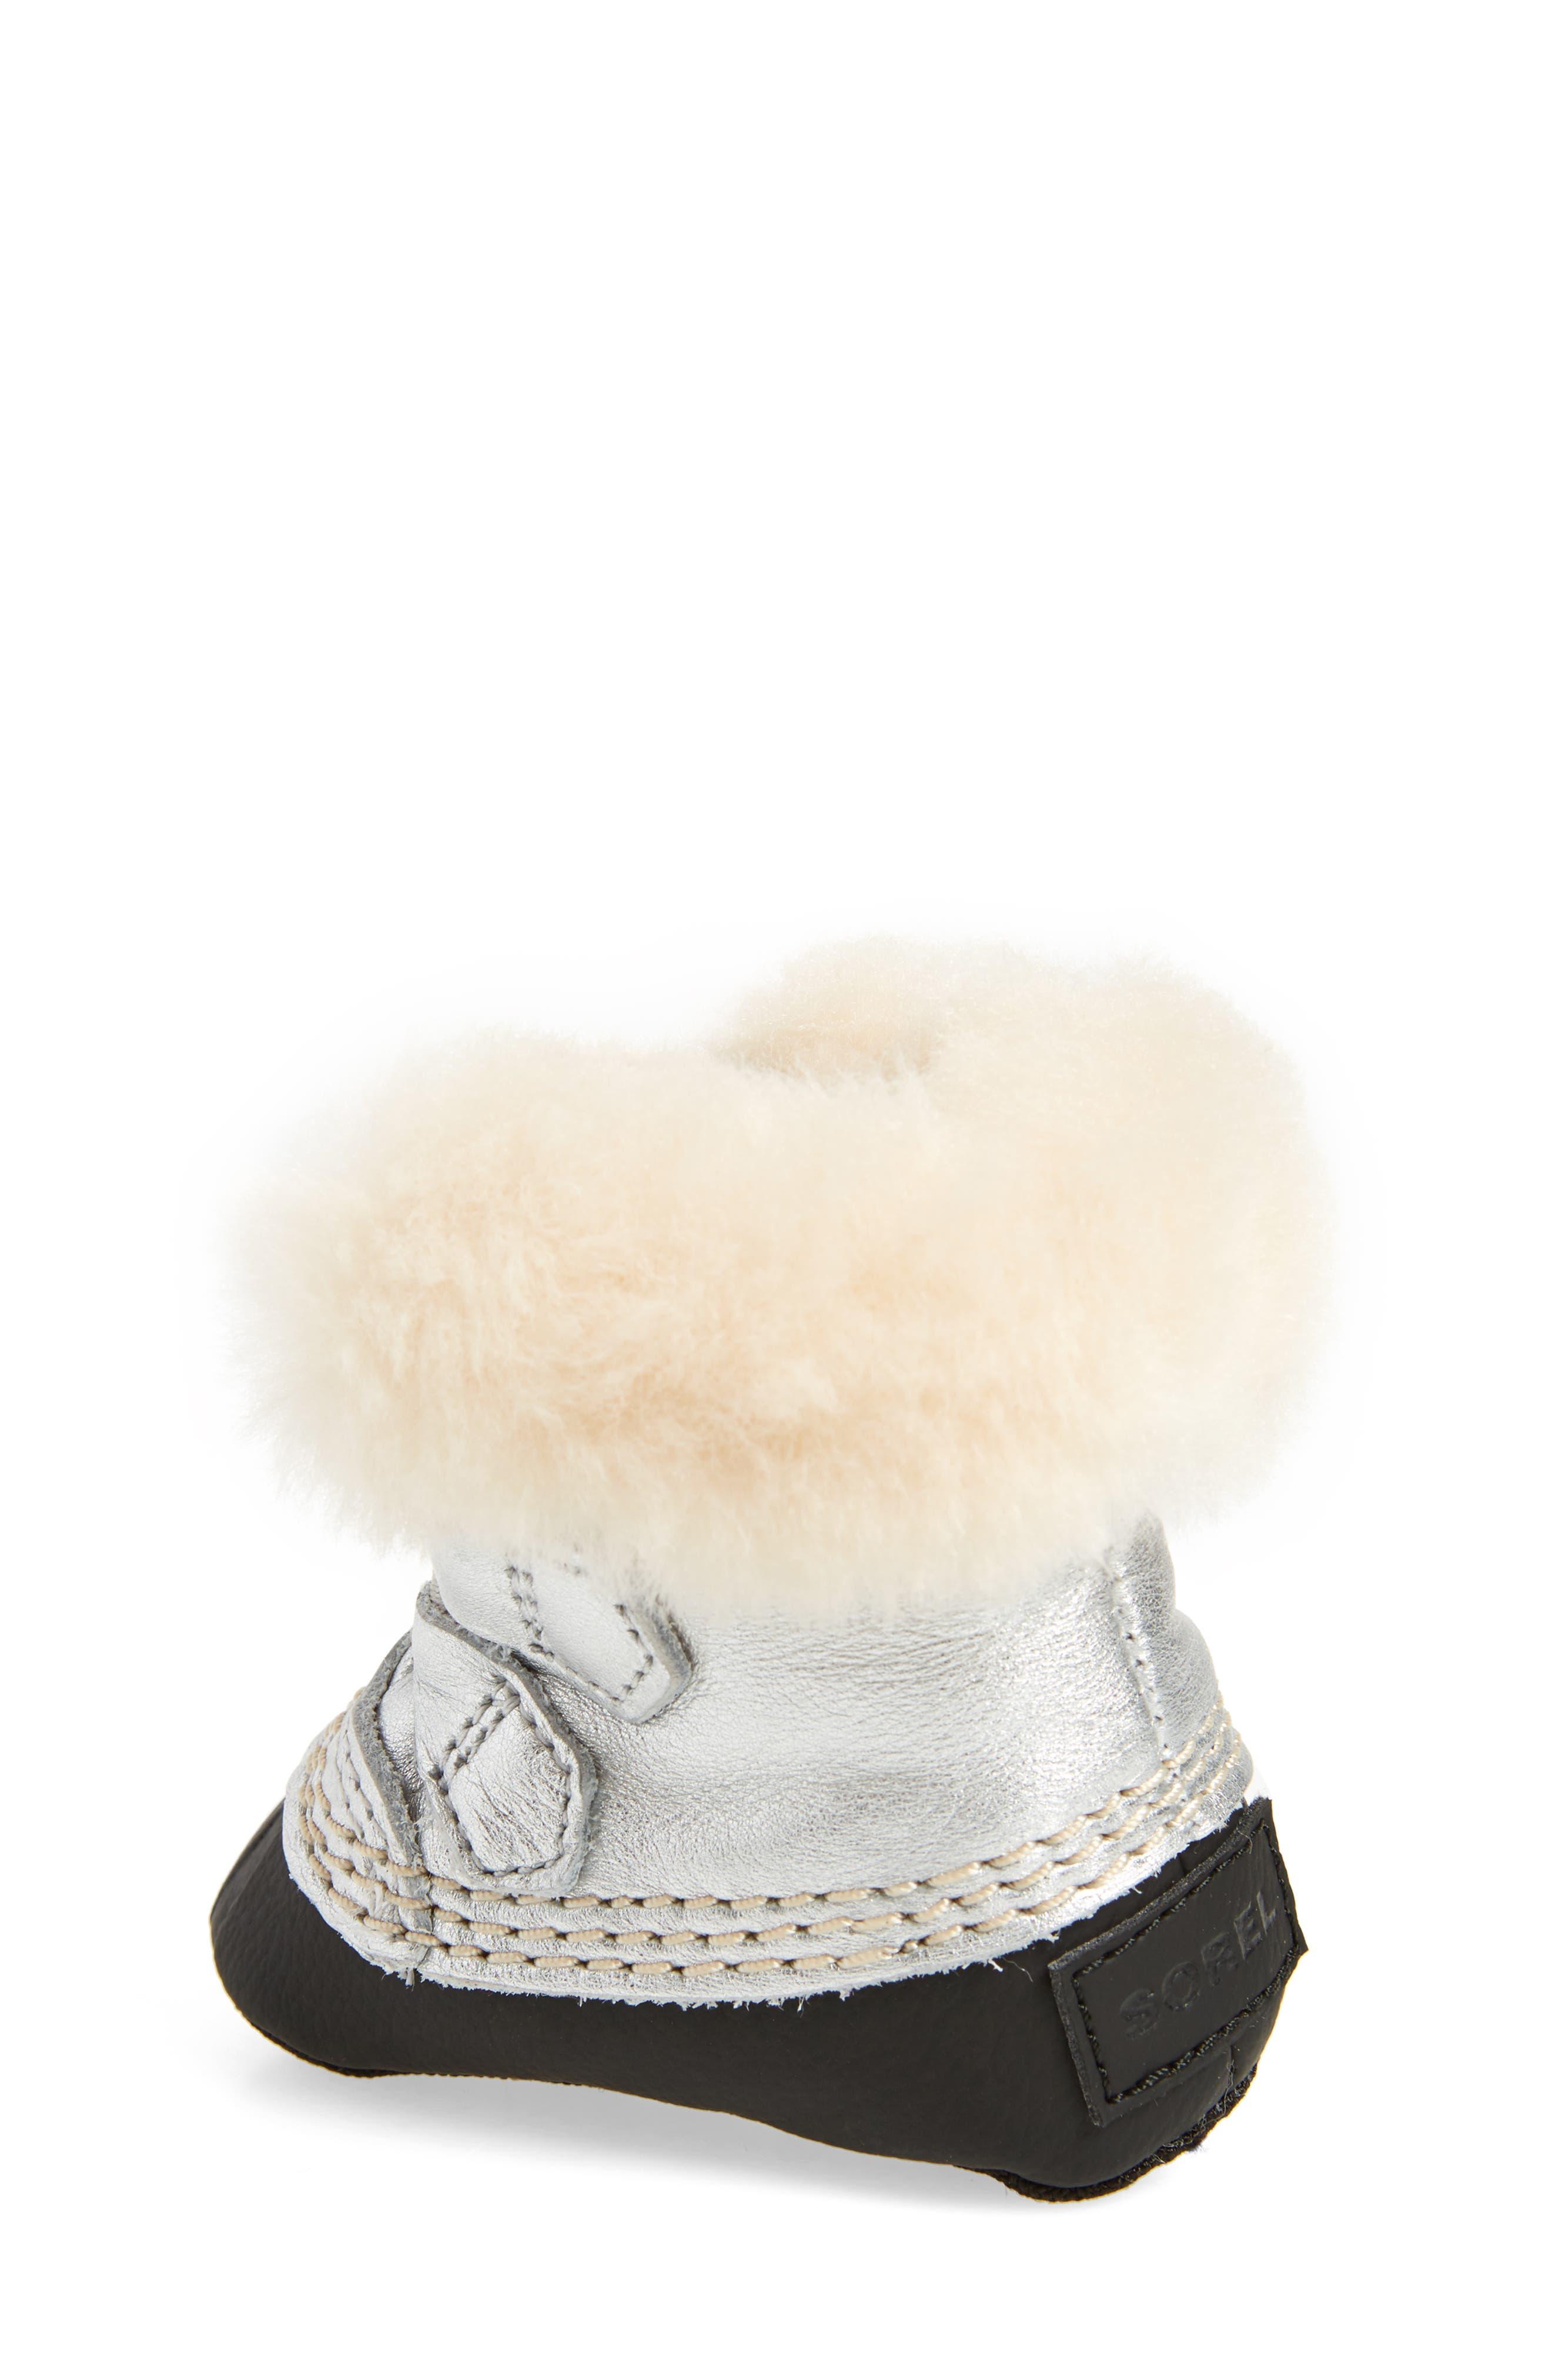 Caribootie Genuine Shearling Crib Shoe,                             Alternate thumbnail 8, color,